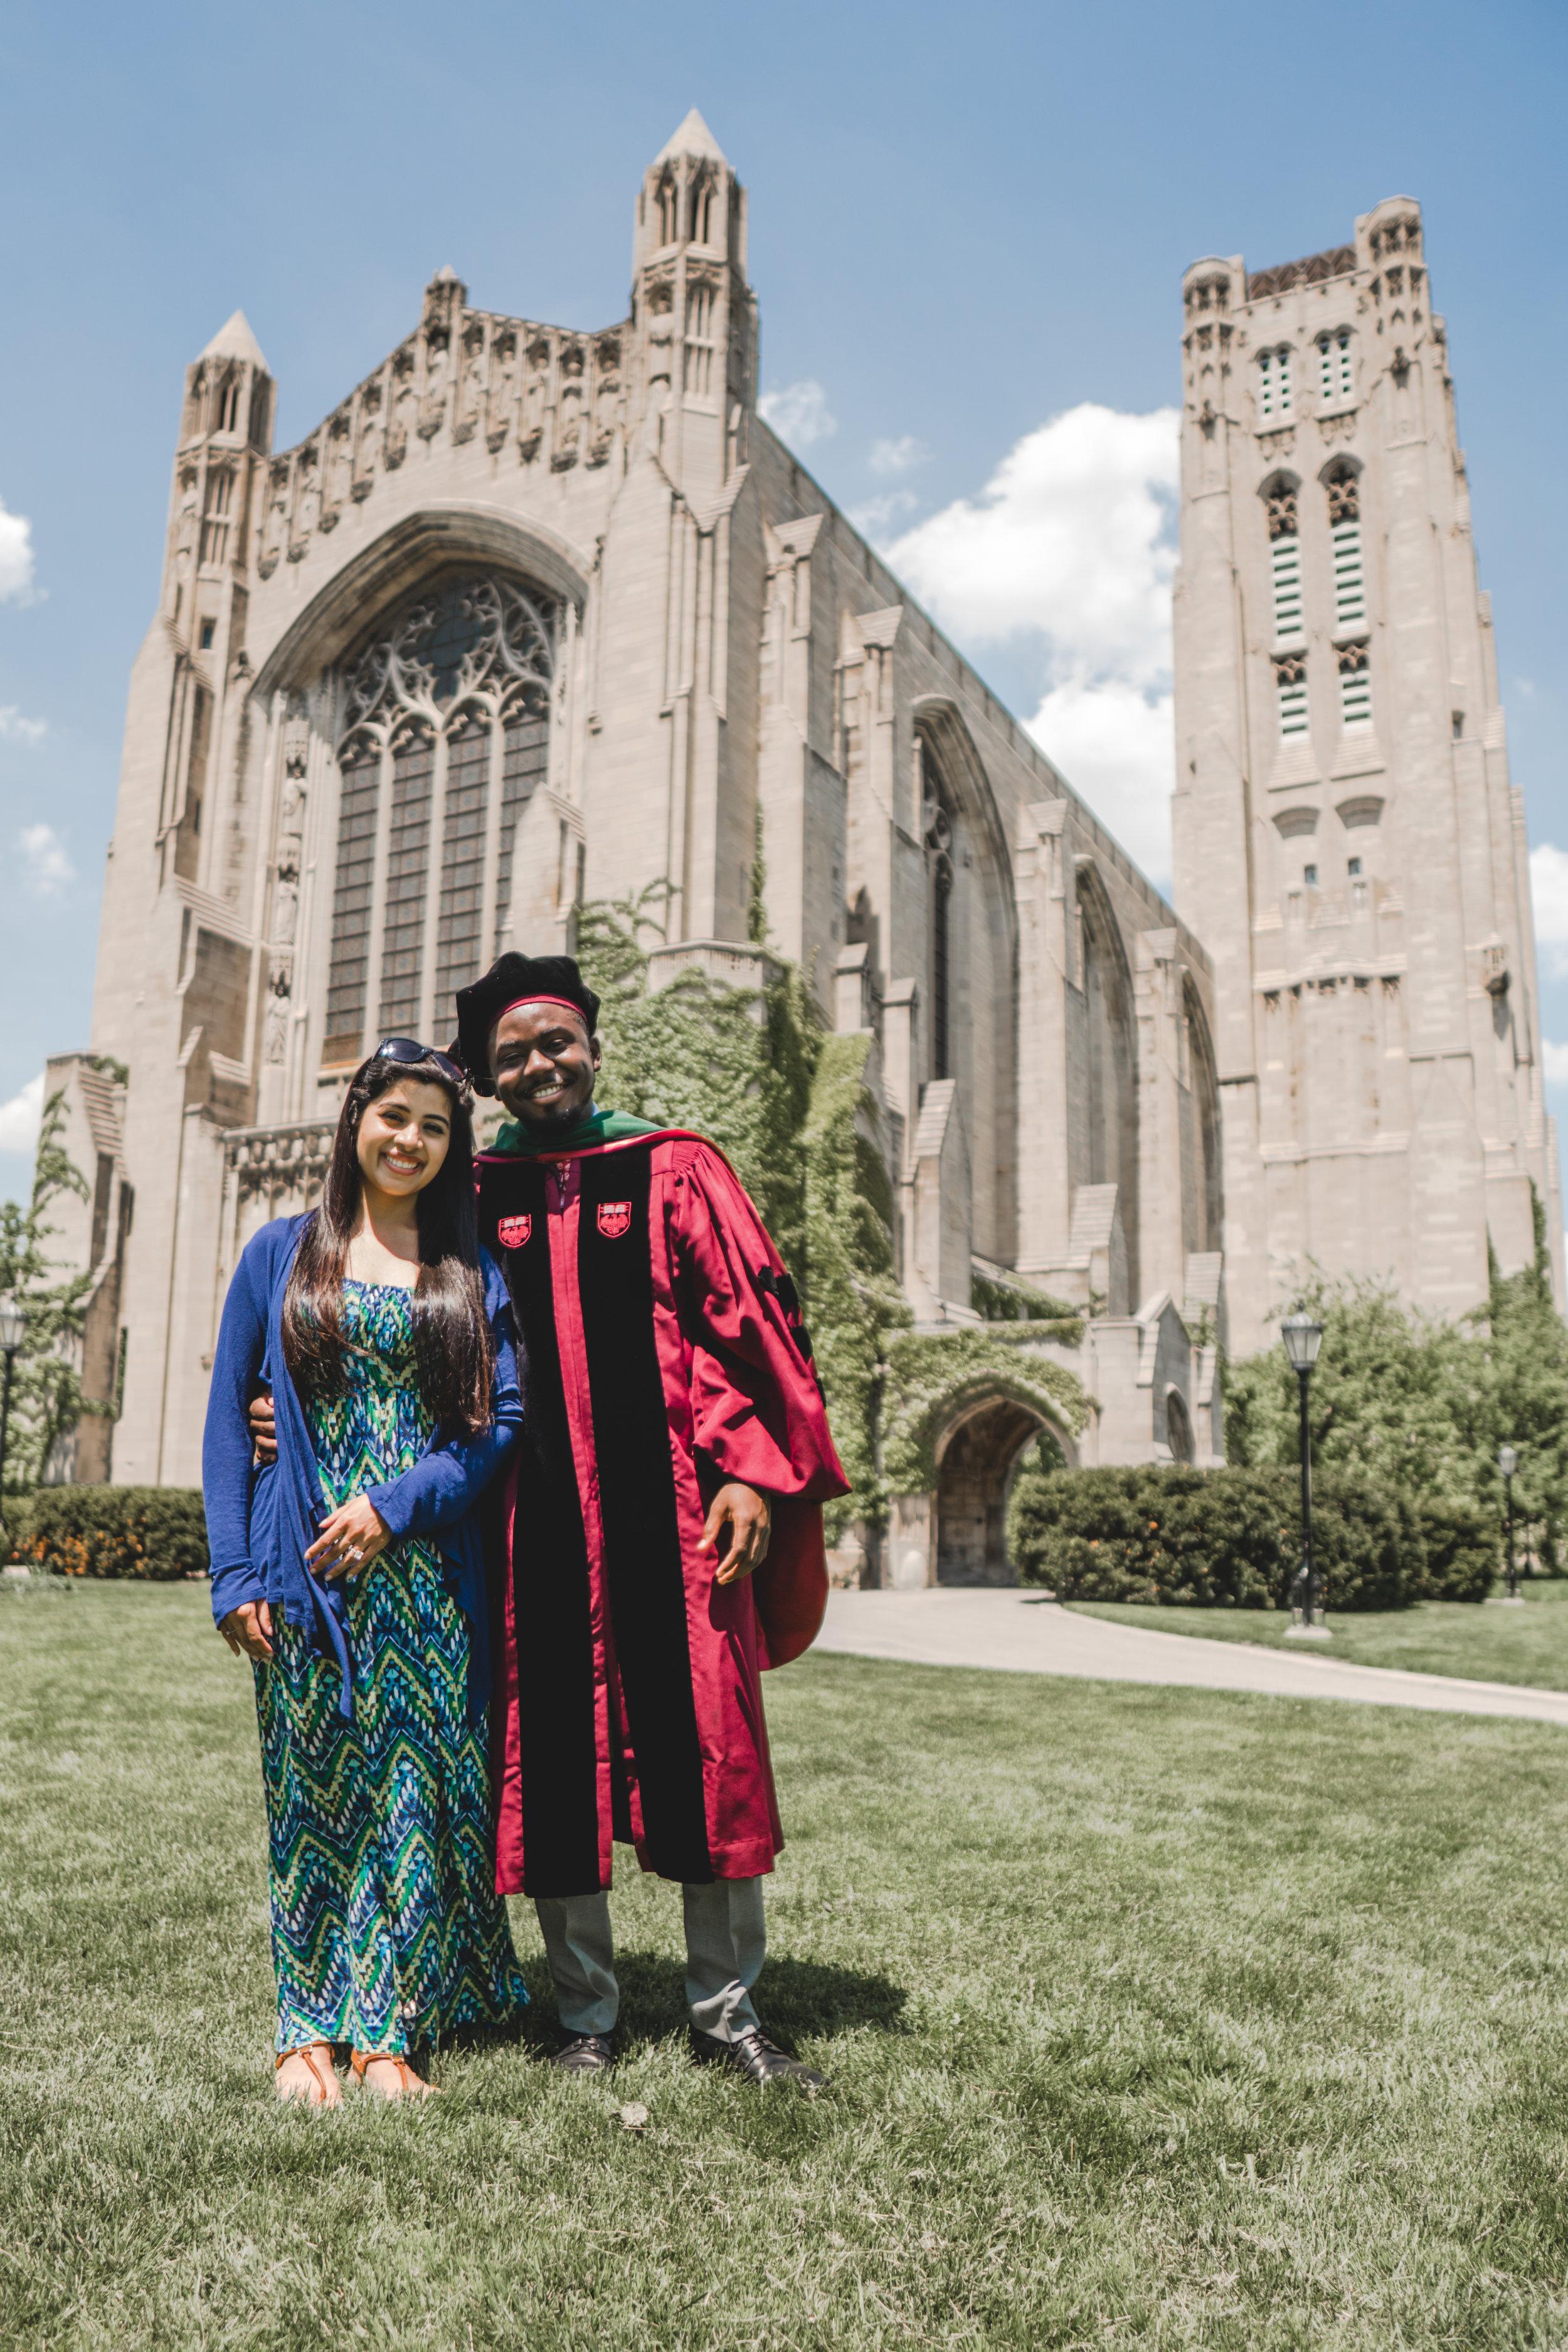 Jordan Green Graduation 5.25.18 - Datflipmel Photo & Films-4.jpg